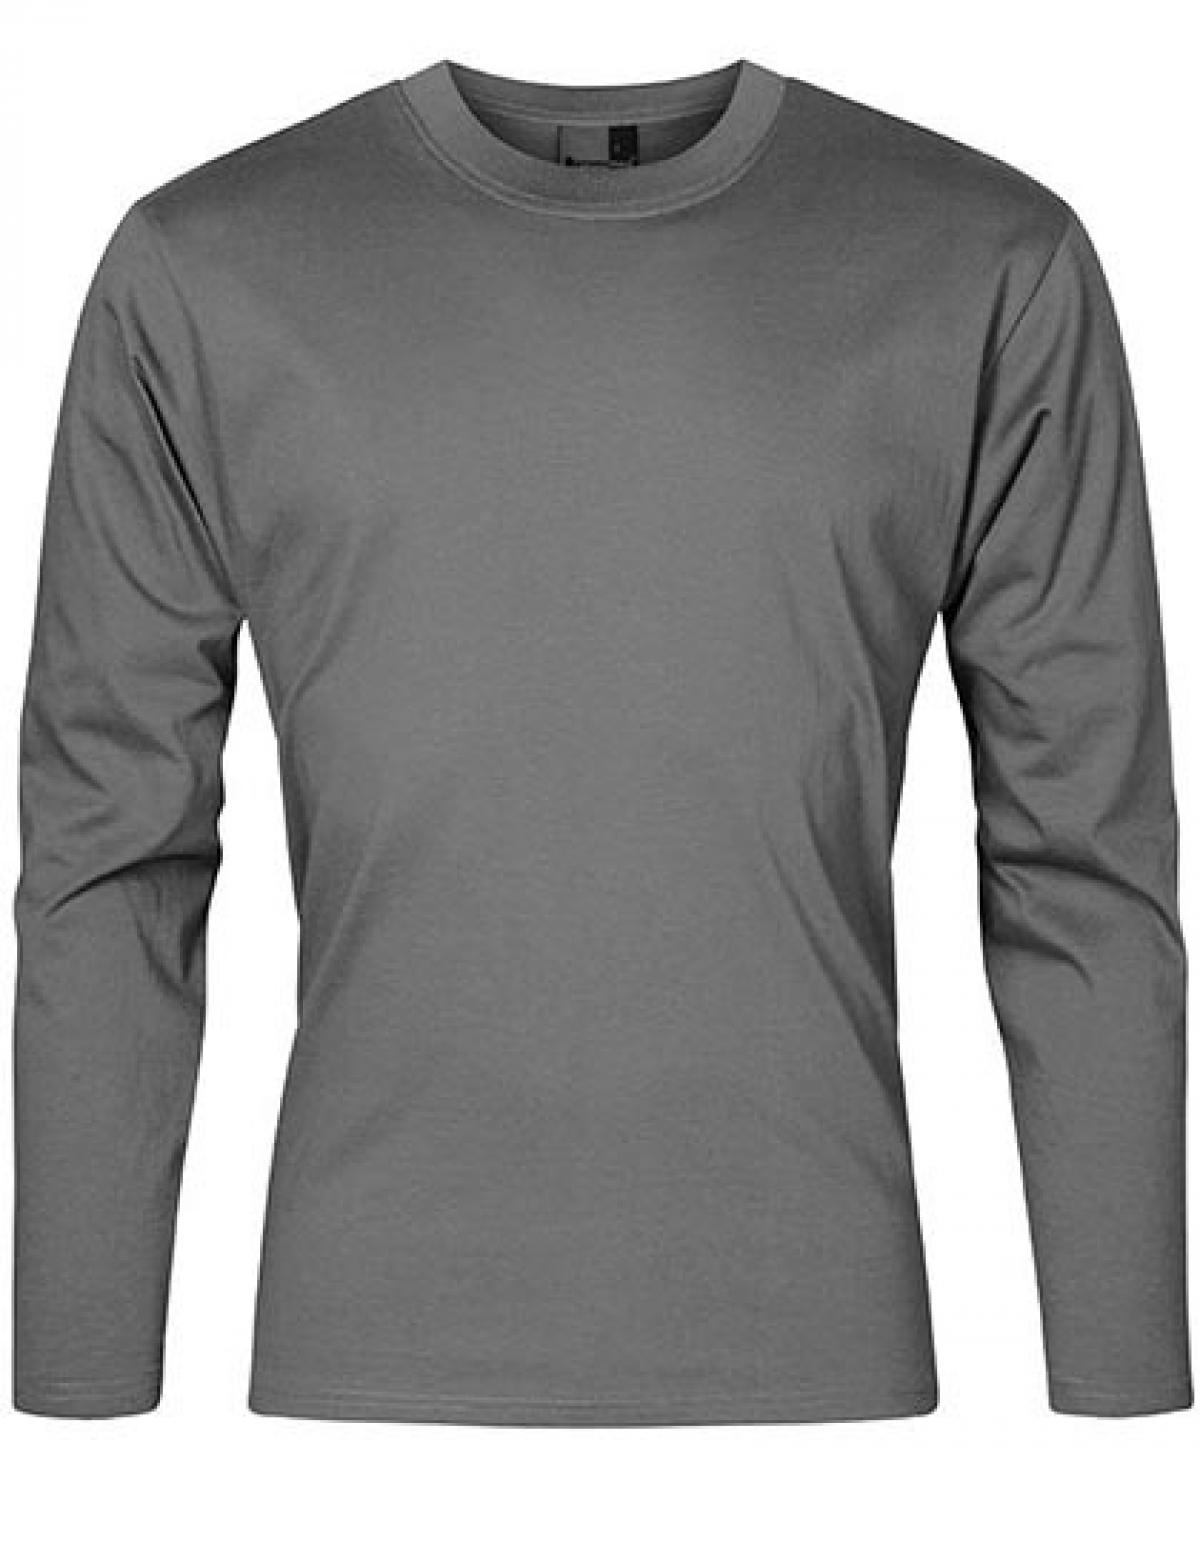 men s premium longsleeve herren t shirt rexlander s. Black Bedroom Furniture Sets. Home Design Ideas